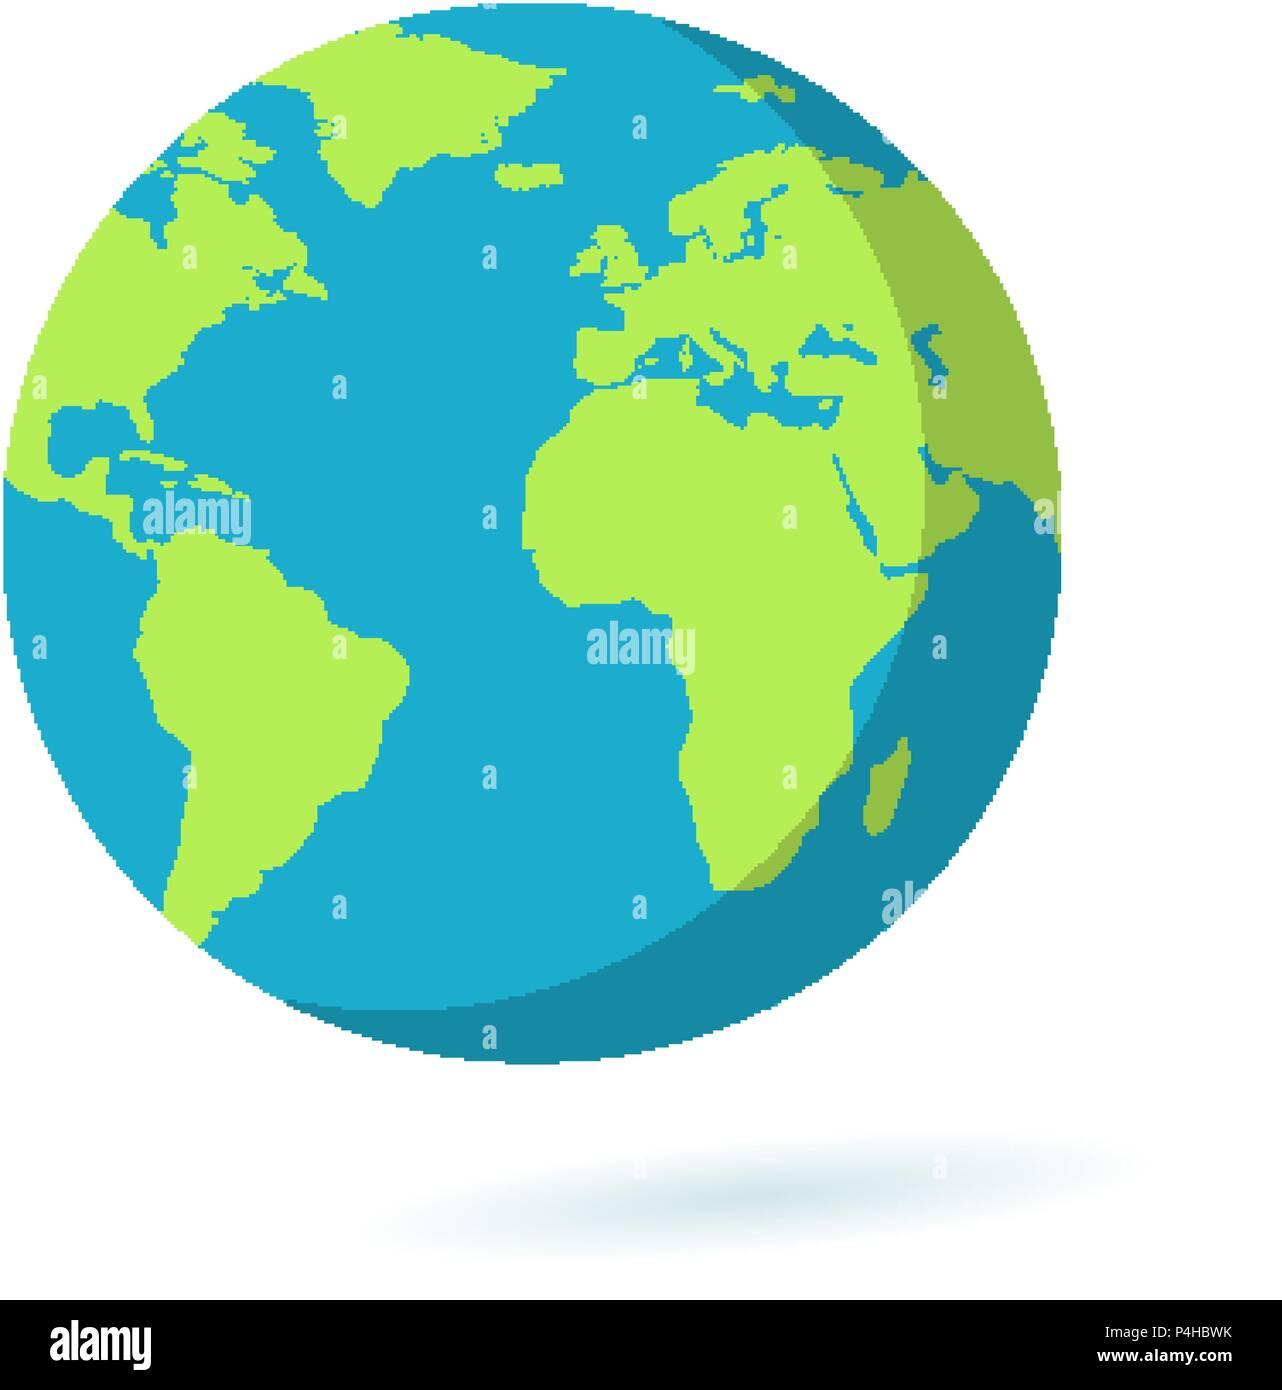 Earth globe flat icon — Stock Vector © game_gfx #51819311   Earth Flat Icon Eps